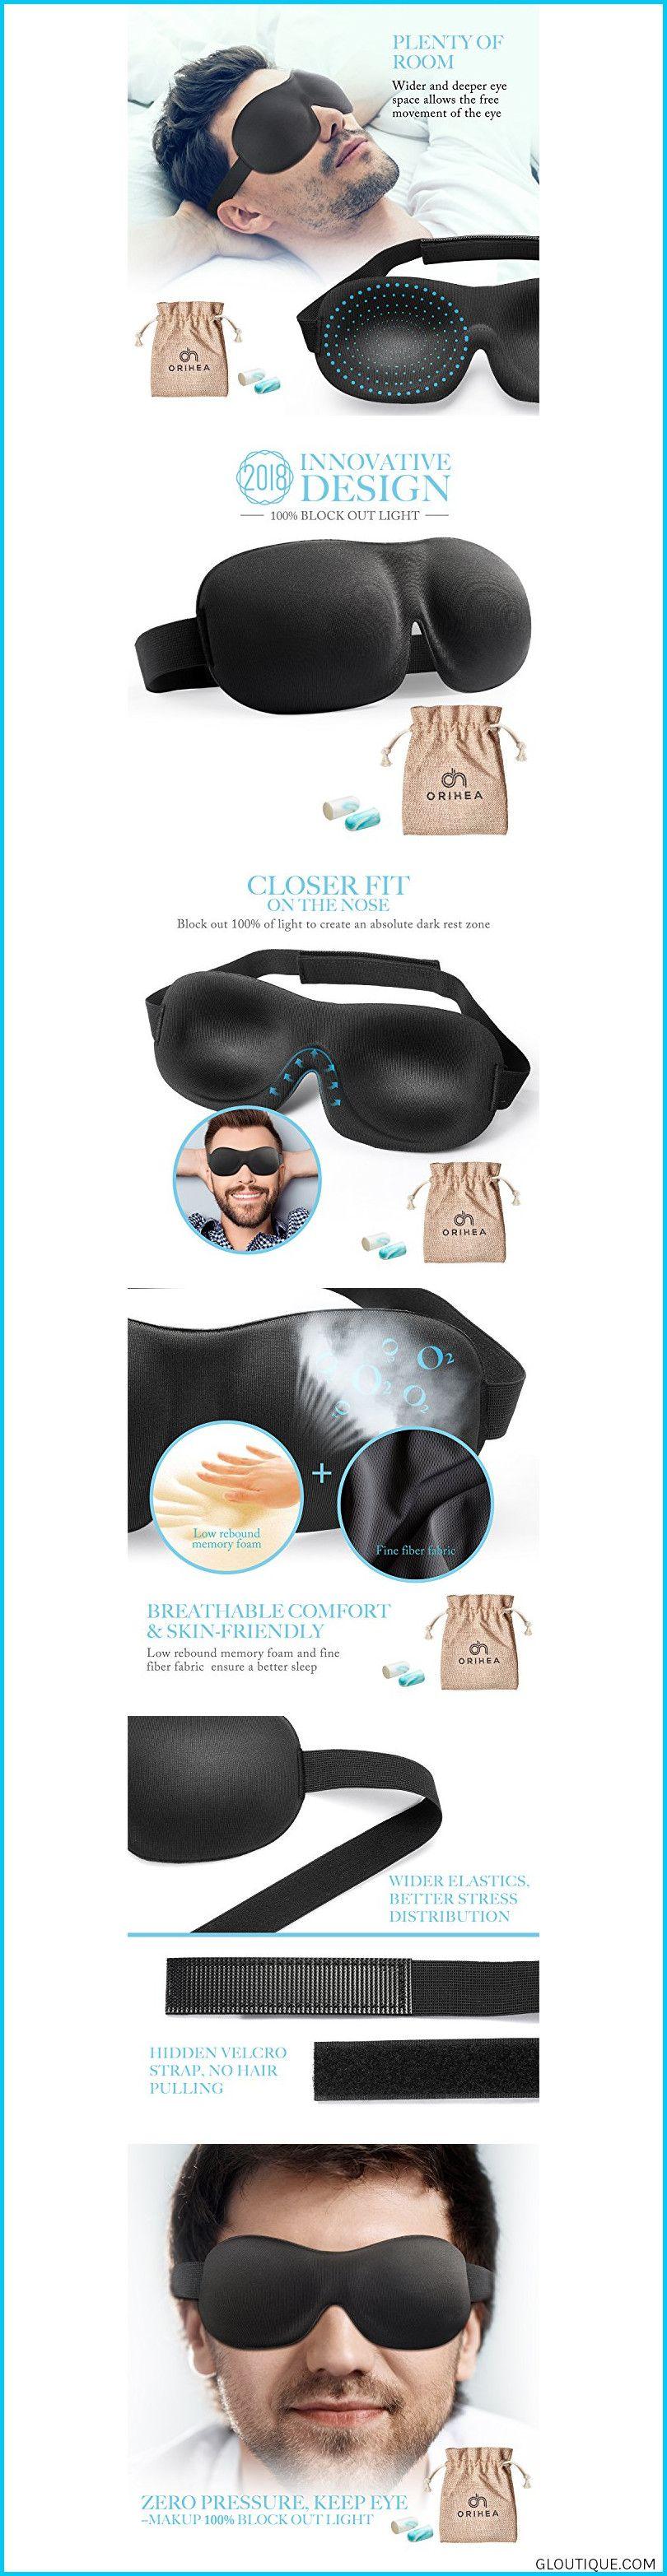 Orihea Eye Mask For Sleeping Sleep Mask For Men And Women Patented Design 100 Blackout Sleep Mask Comfortable Eye Mask Blindfold Black Reviews Comfortable Eye Mask Sleep Mask Blindfold